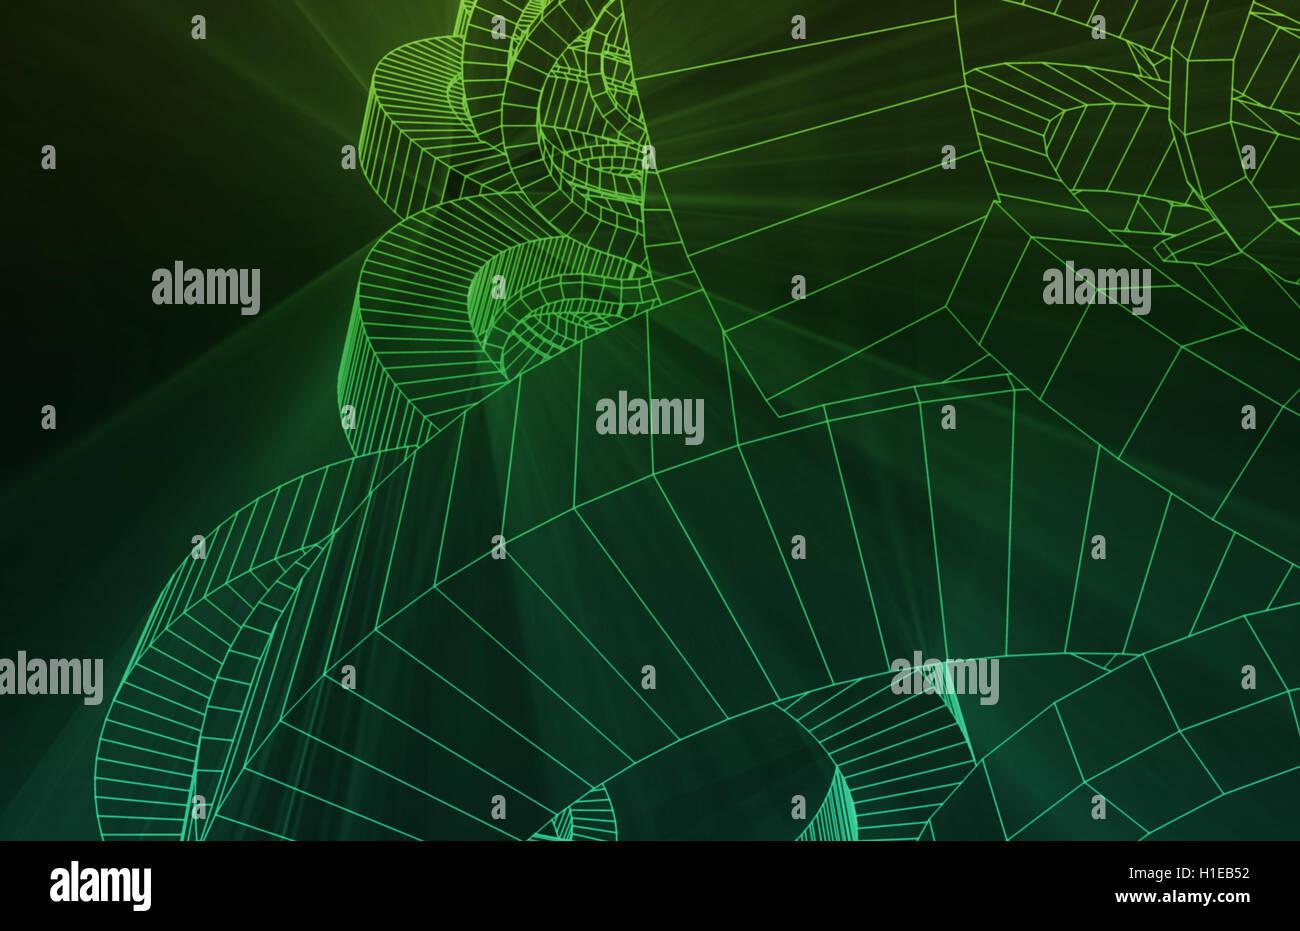 Design Schematics - Stock Image